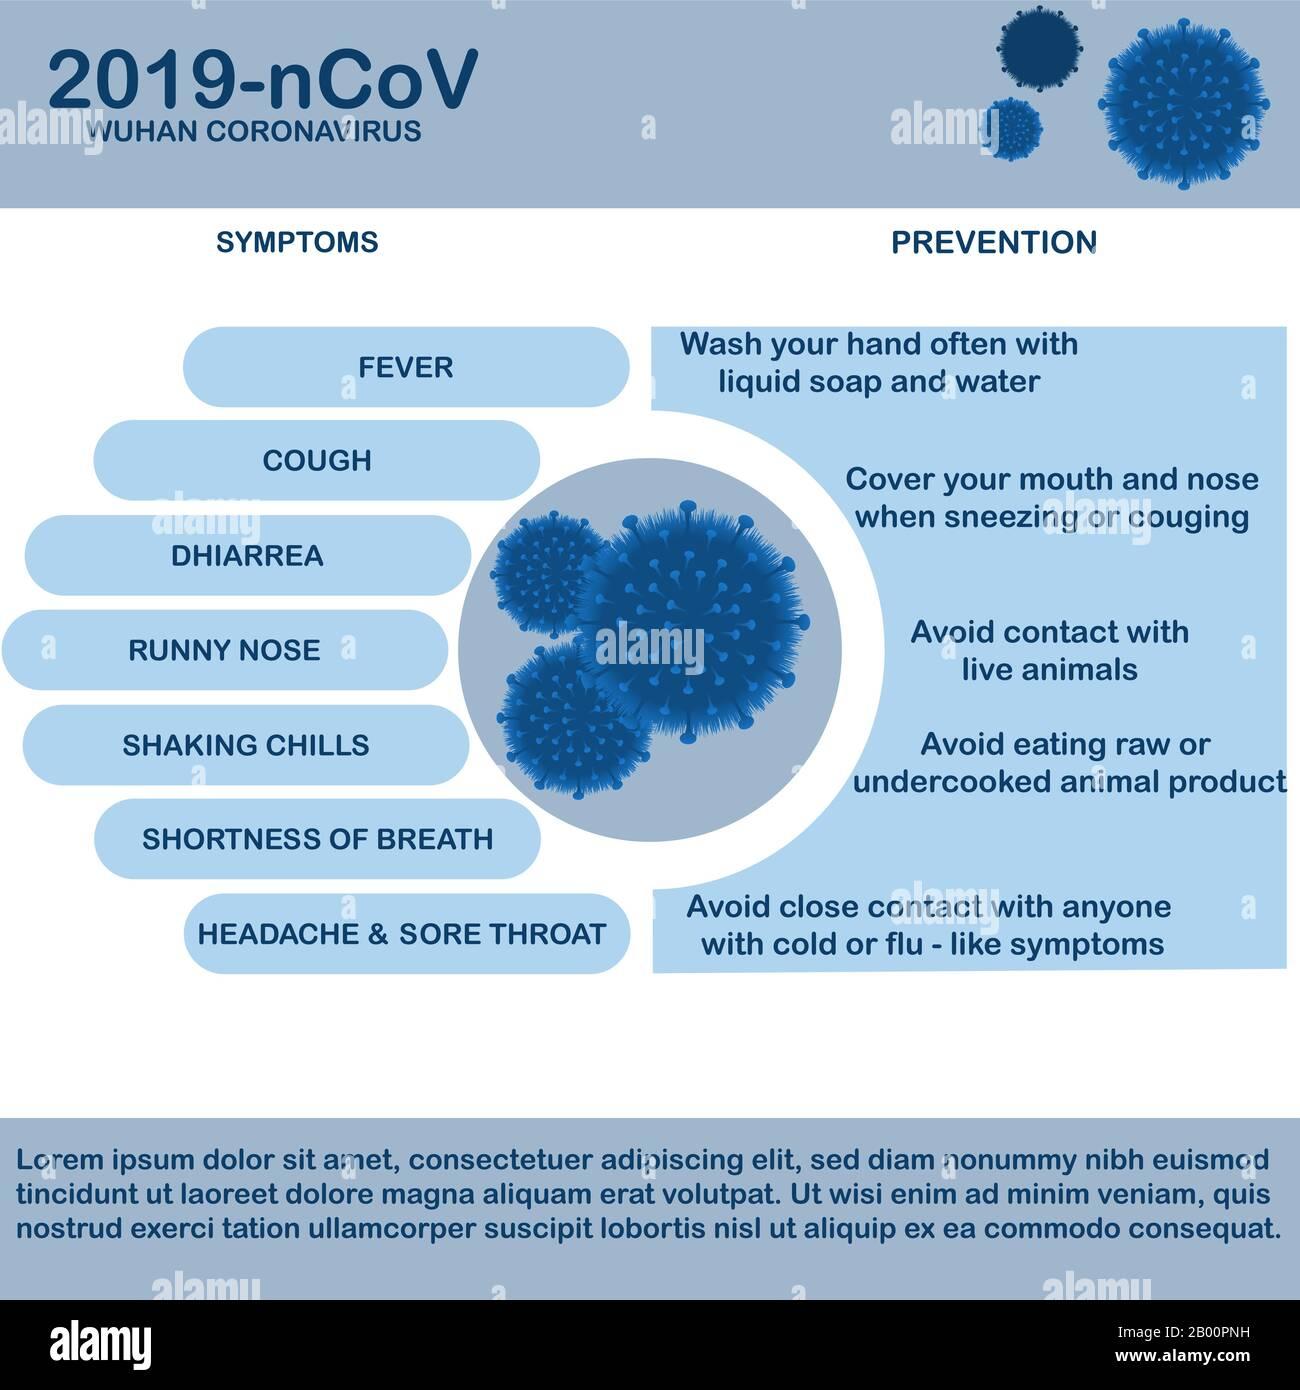 Coronavirus 2019-nCoV infographic: symptoms and prevention ...